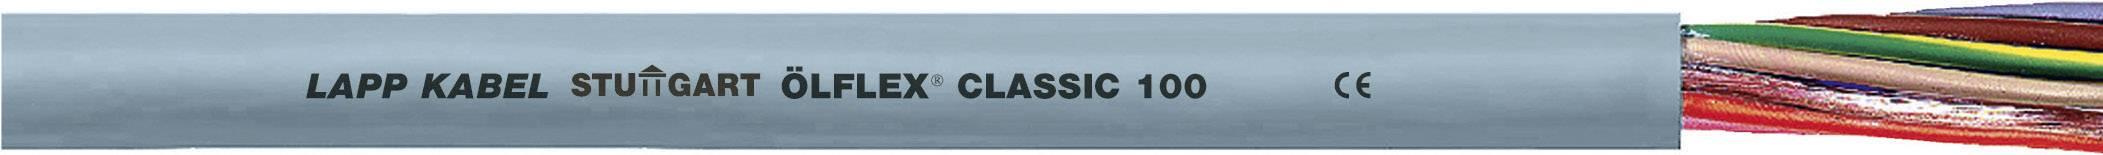 Kabel LappKabel Ölflex CLASSIC 100 7G2,5 (0010091), PVC, 13,1 mm, 750 V, šedá, 300 m